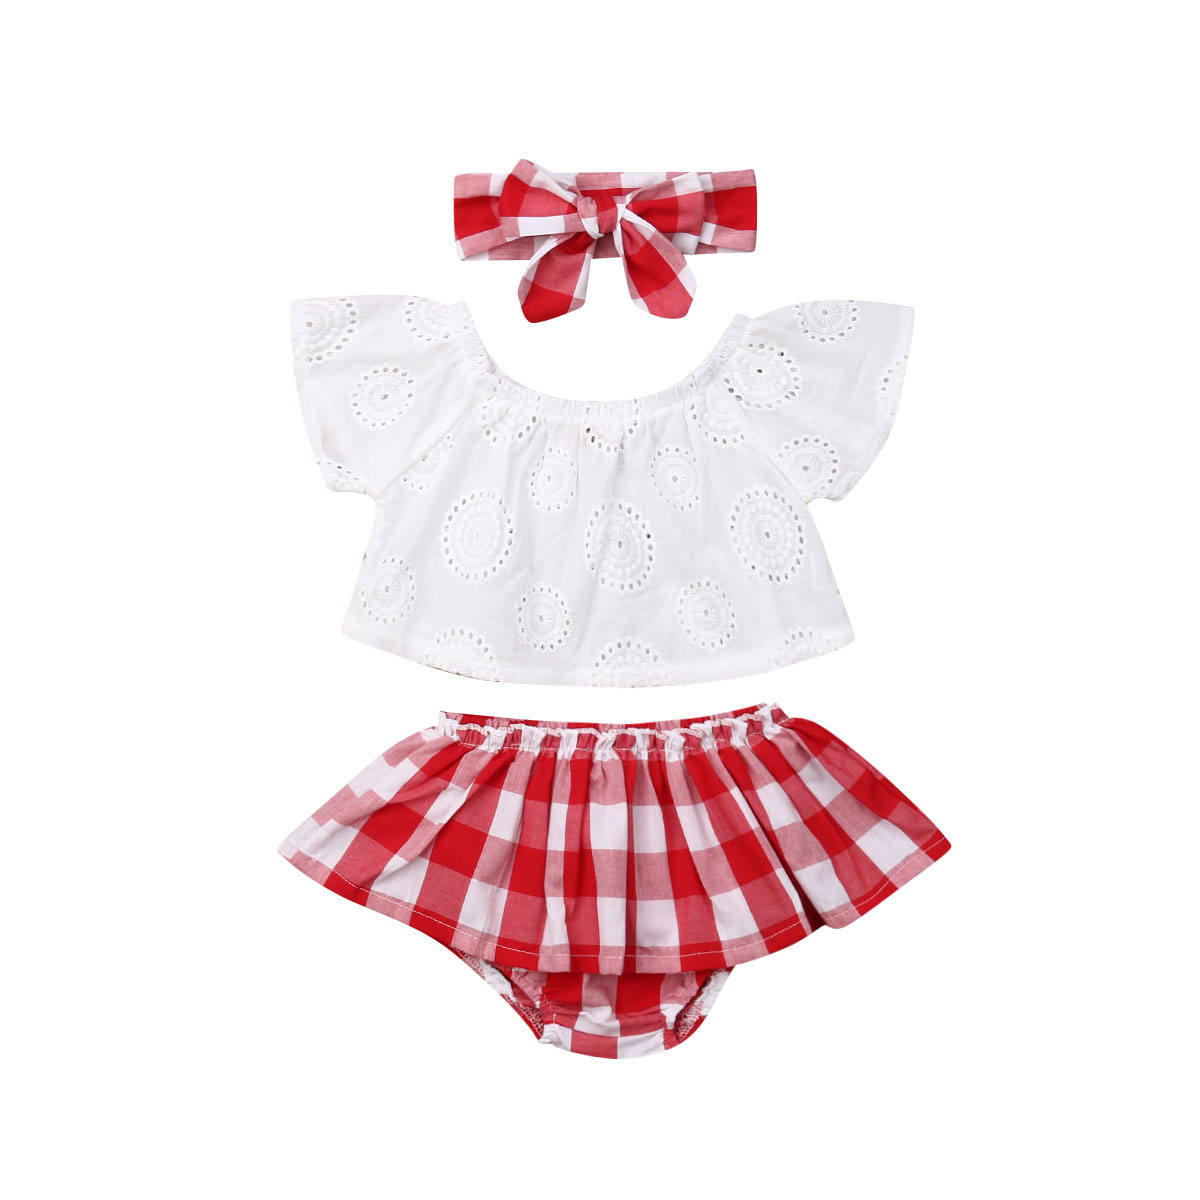 0-24M Infant Newborn Baby Girls Clothing Set White Off Shoulder T Shirts + Red Plaid Skirts + Headband Summer Baby Girl Costume